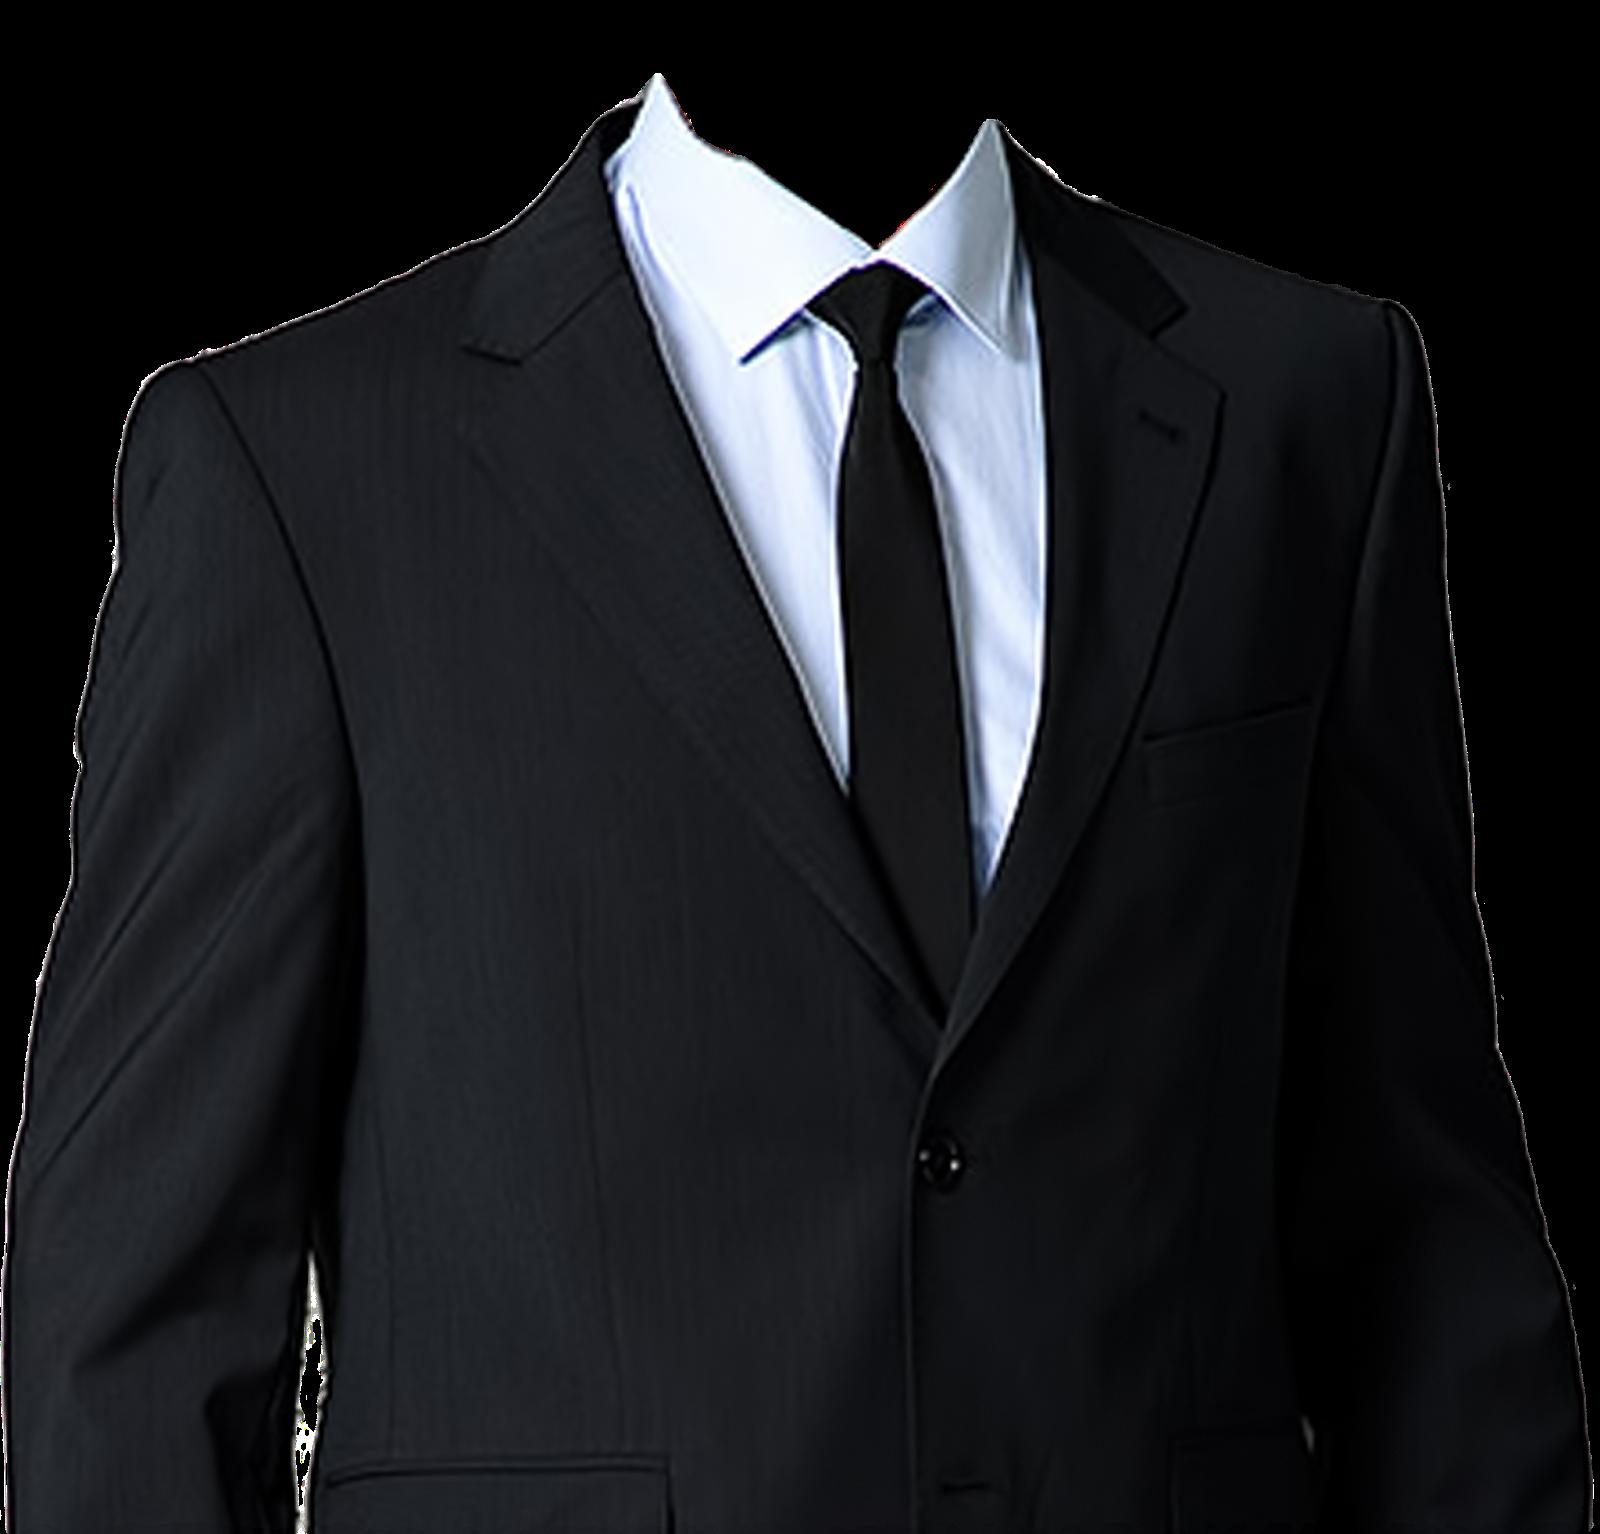 suit png images free download pngimg com